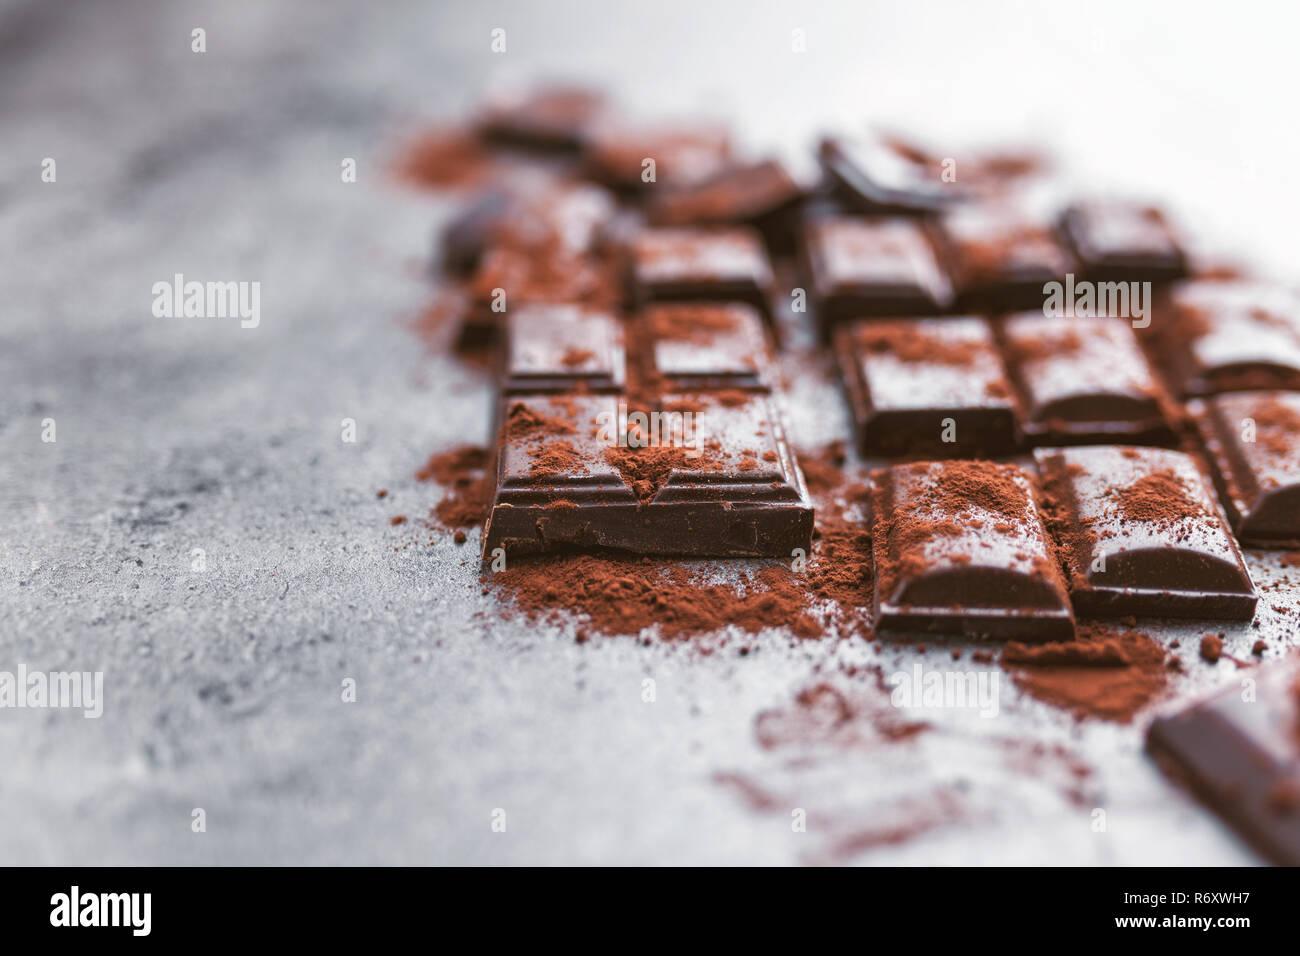 Dark chocolate with cocoa porwder - Stock Image